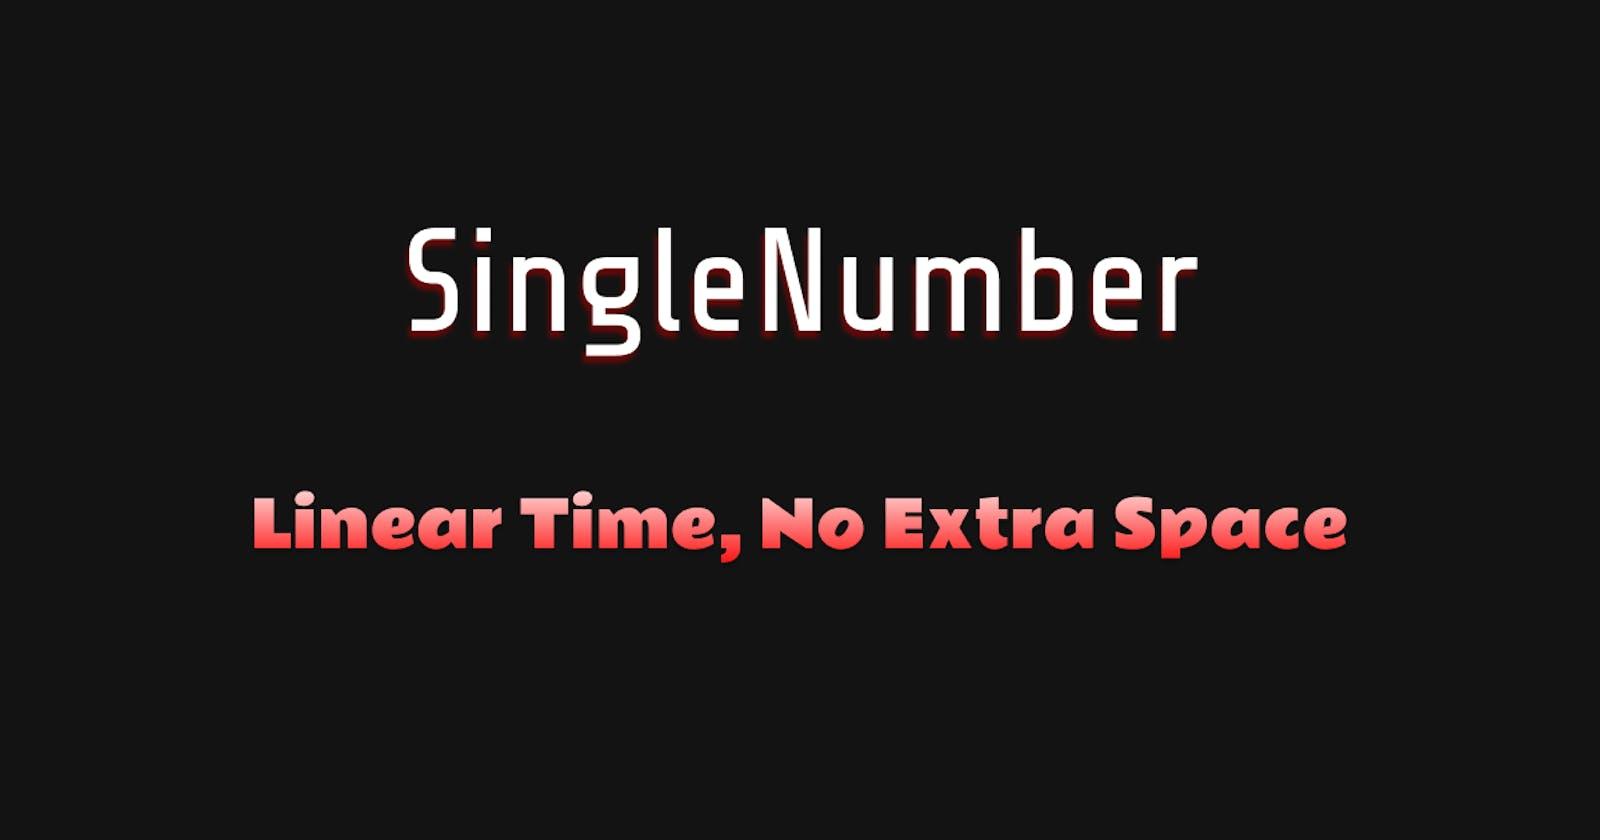 SingleNumber